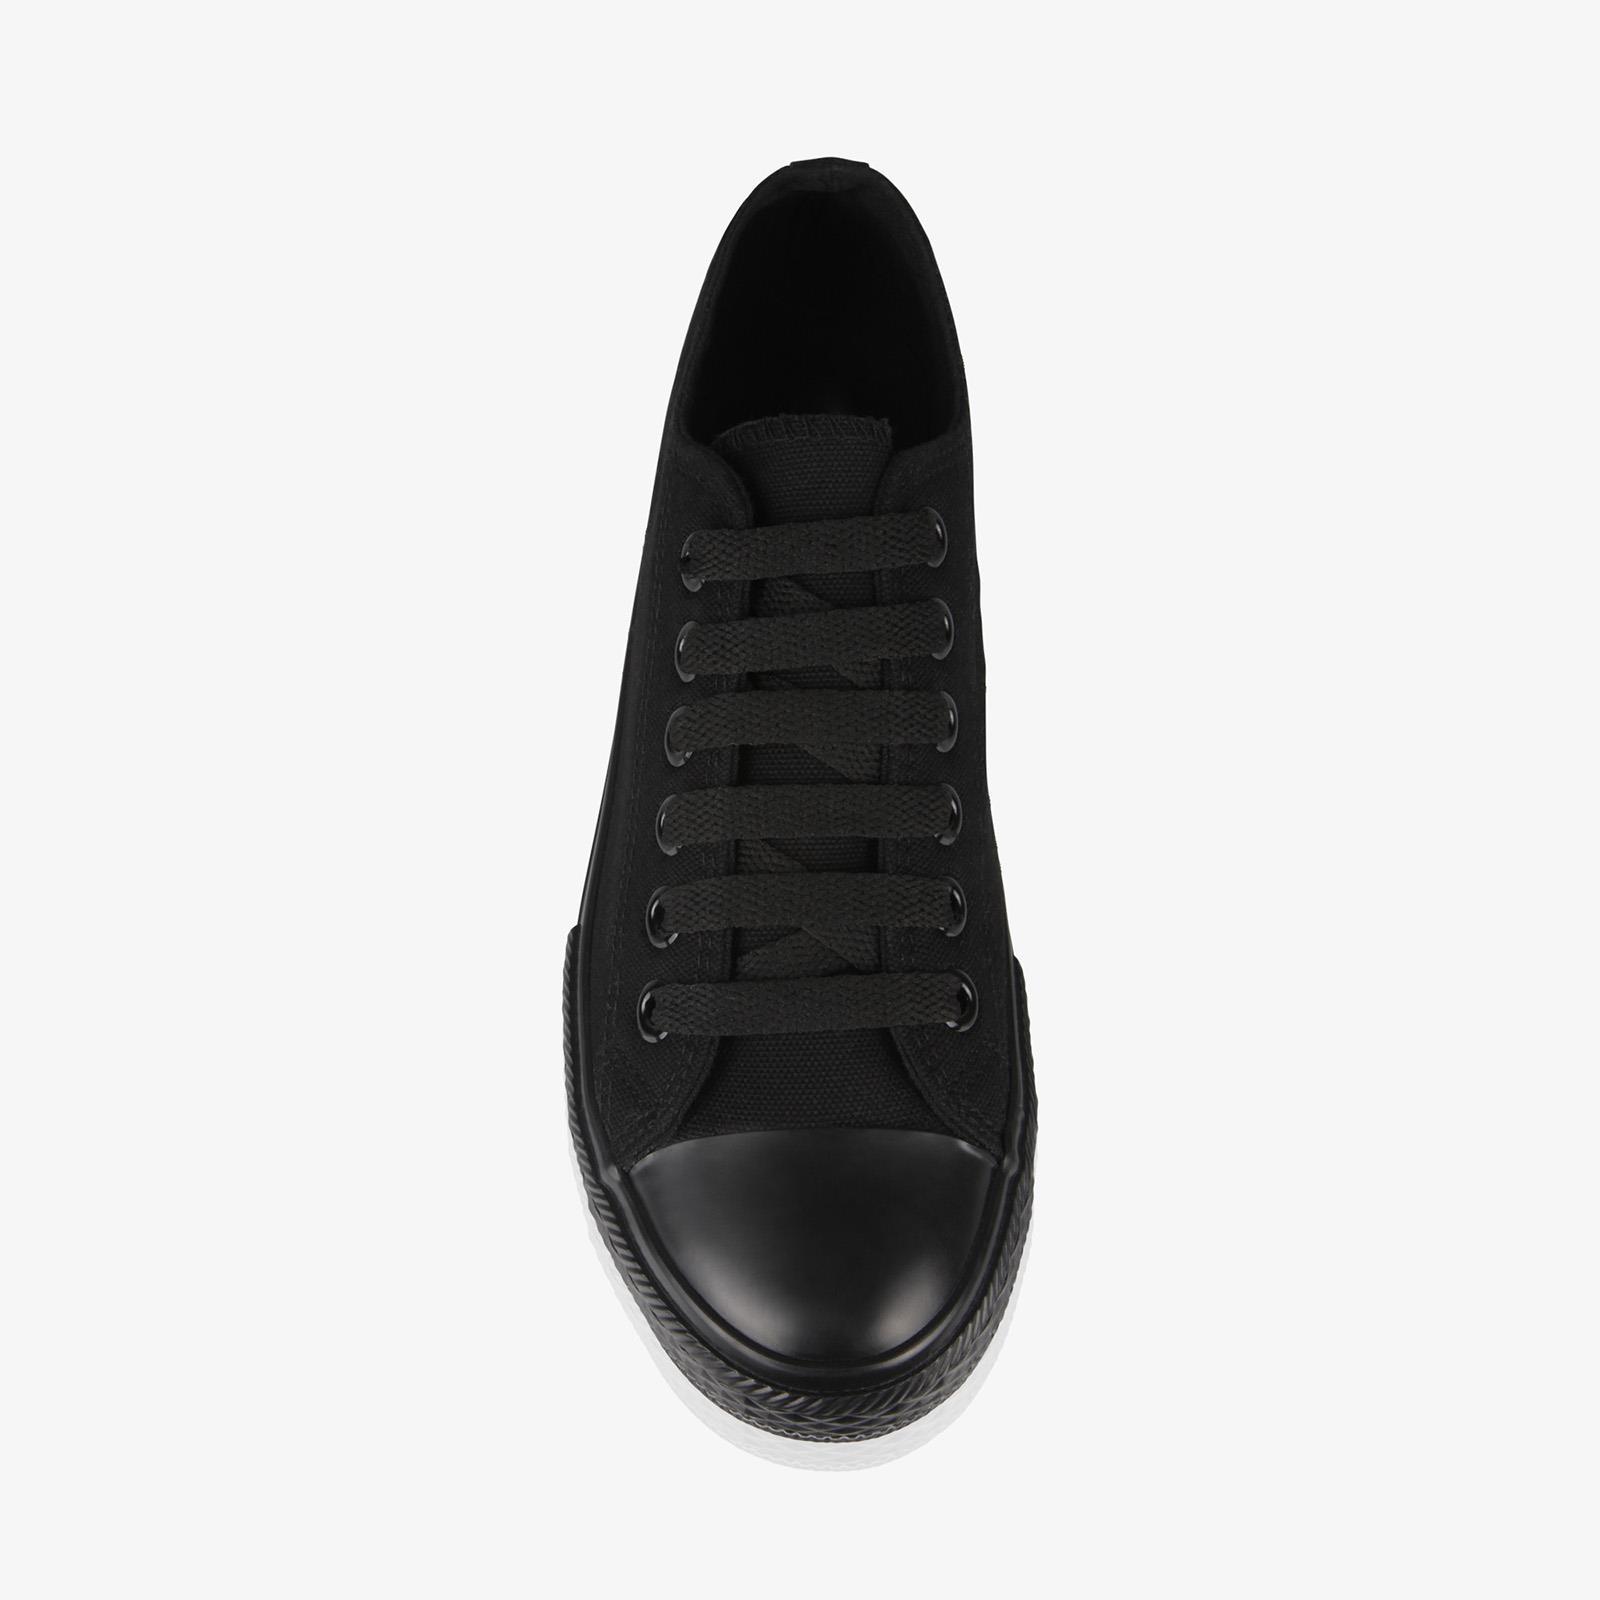 Zapatillas-Mujer-Casuales-Deportiva-Barata-Lona-Moda-Originales-Outlet-Tela-Moda miniatura 29